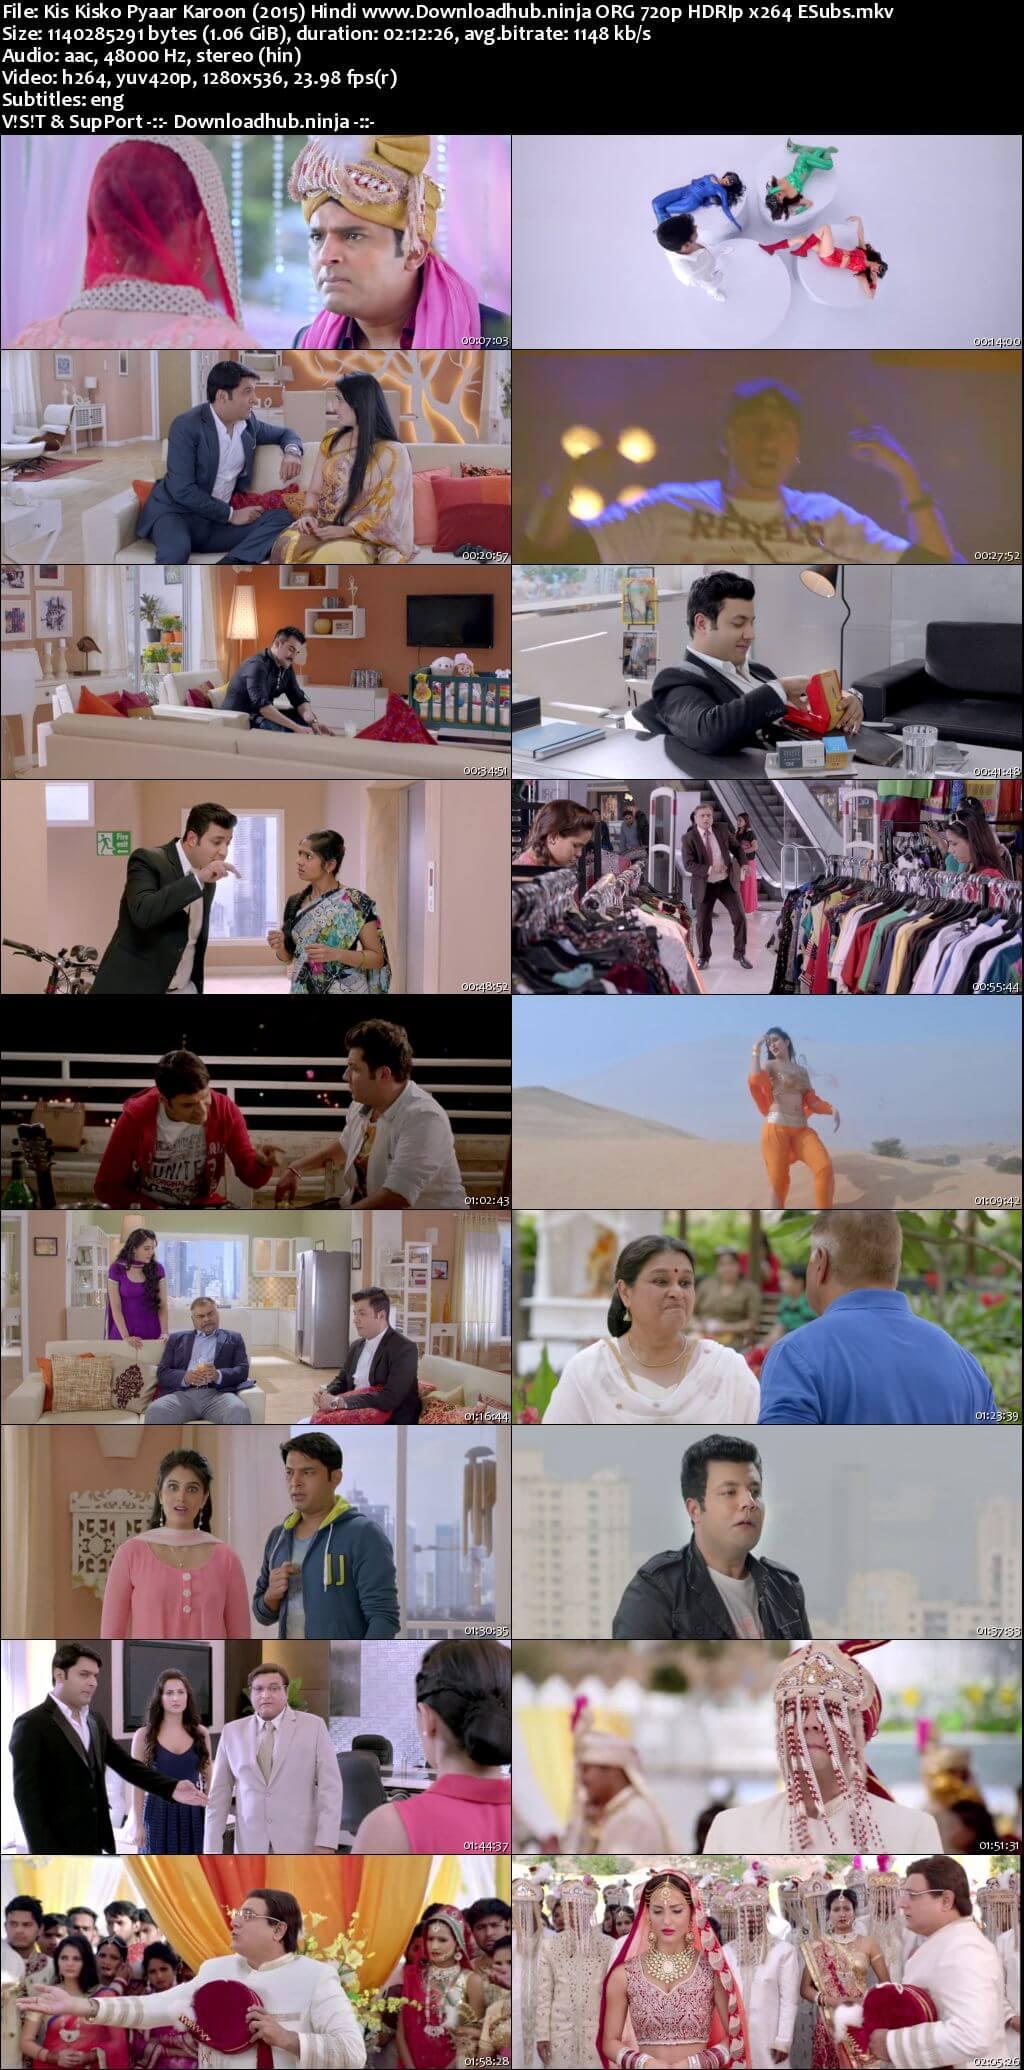 Kis Kisko Pyaar Karoon 2015 Hindi 720p HDRip ESubs